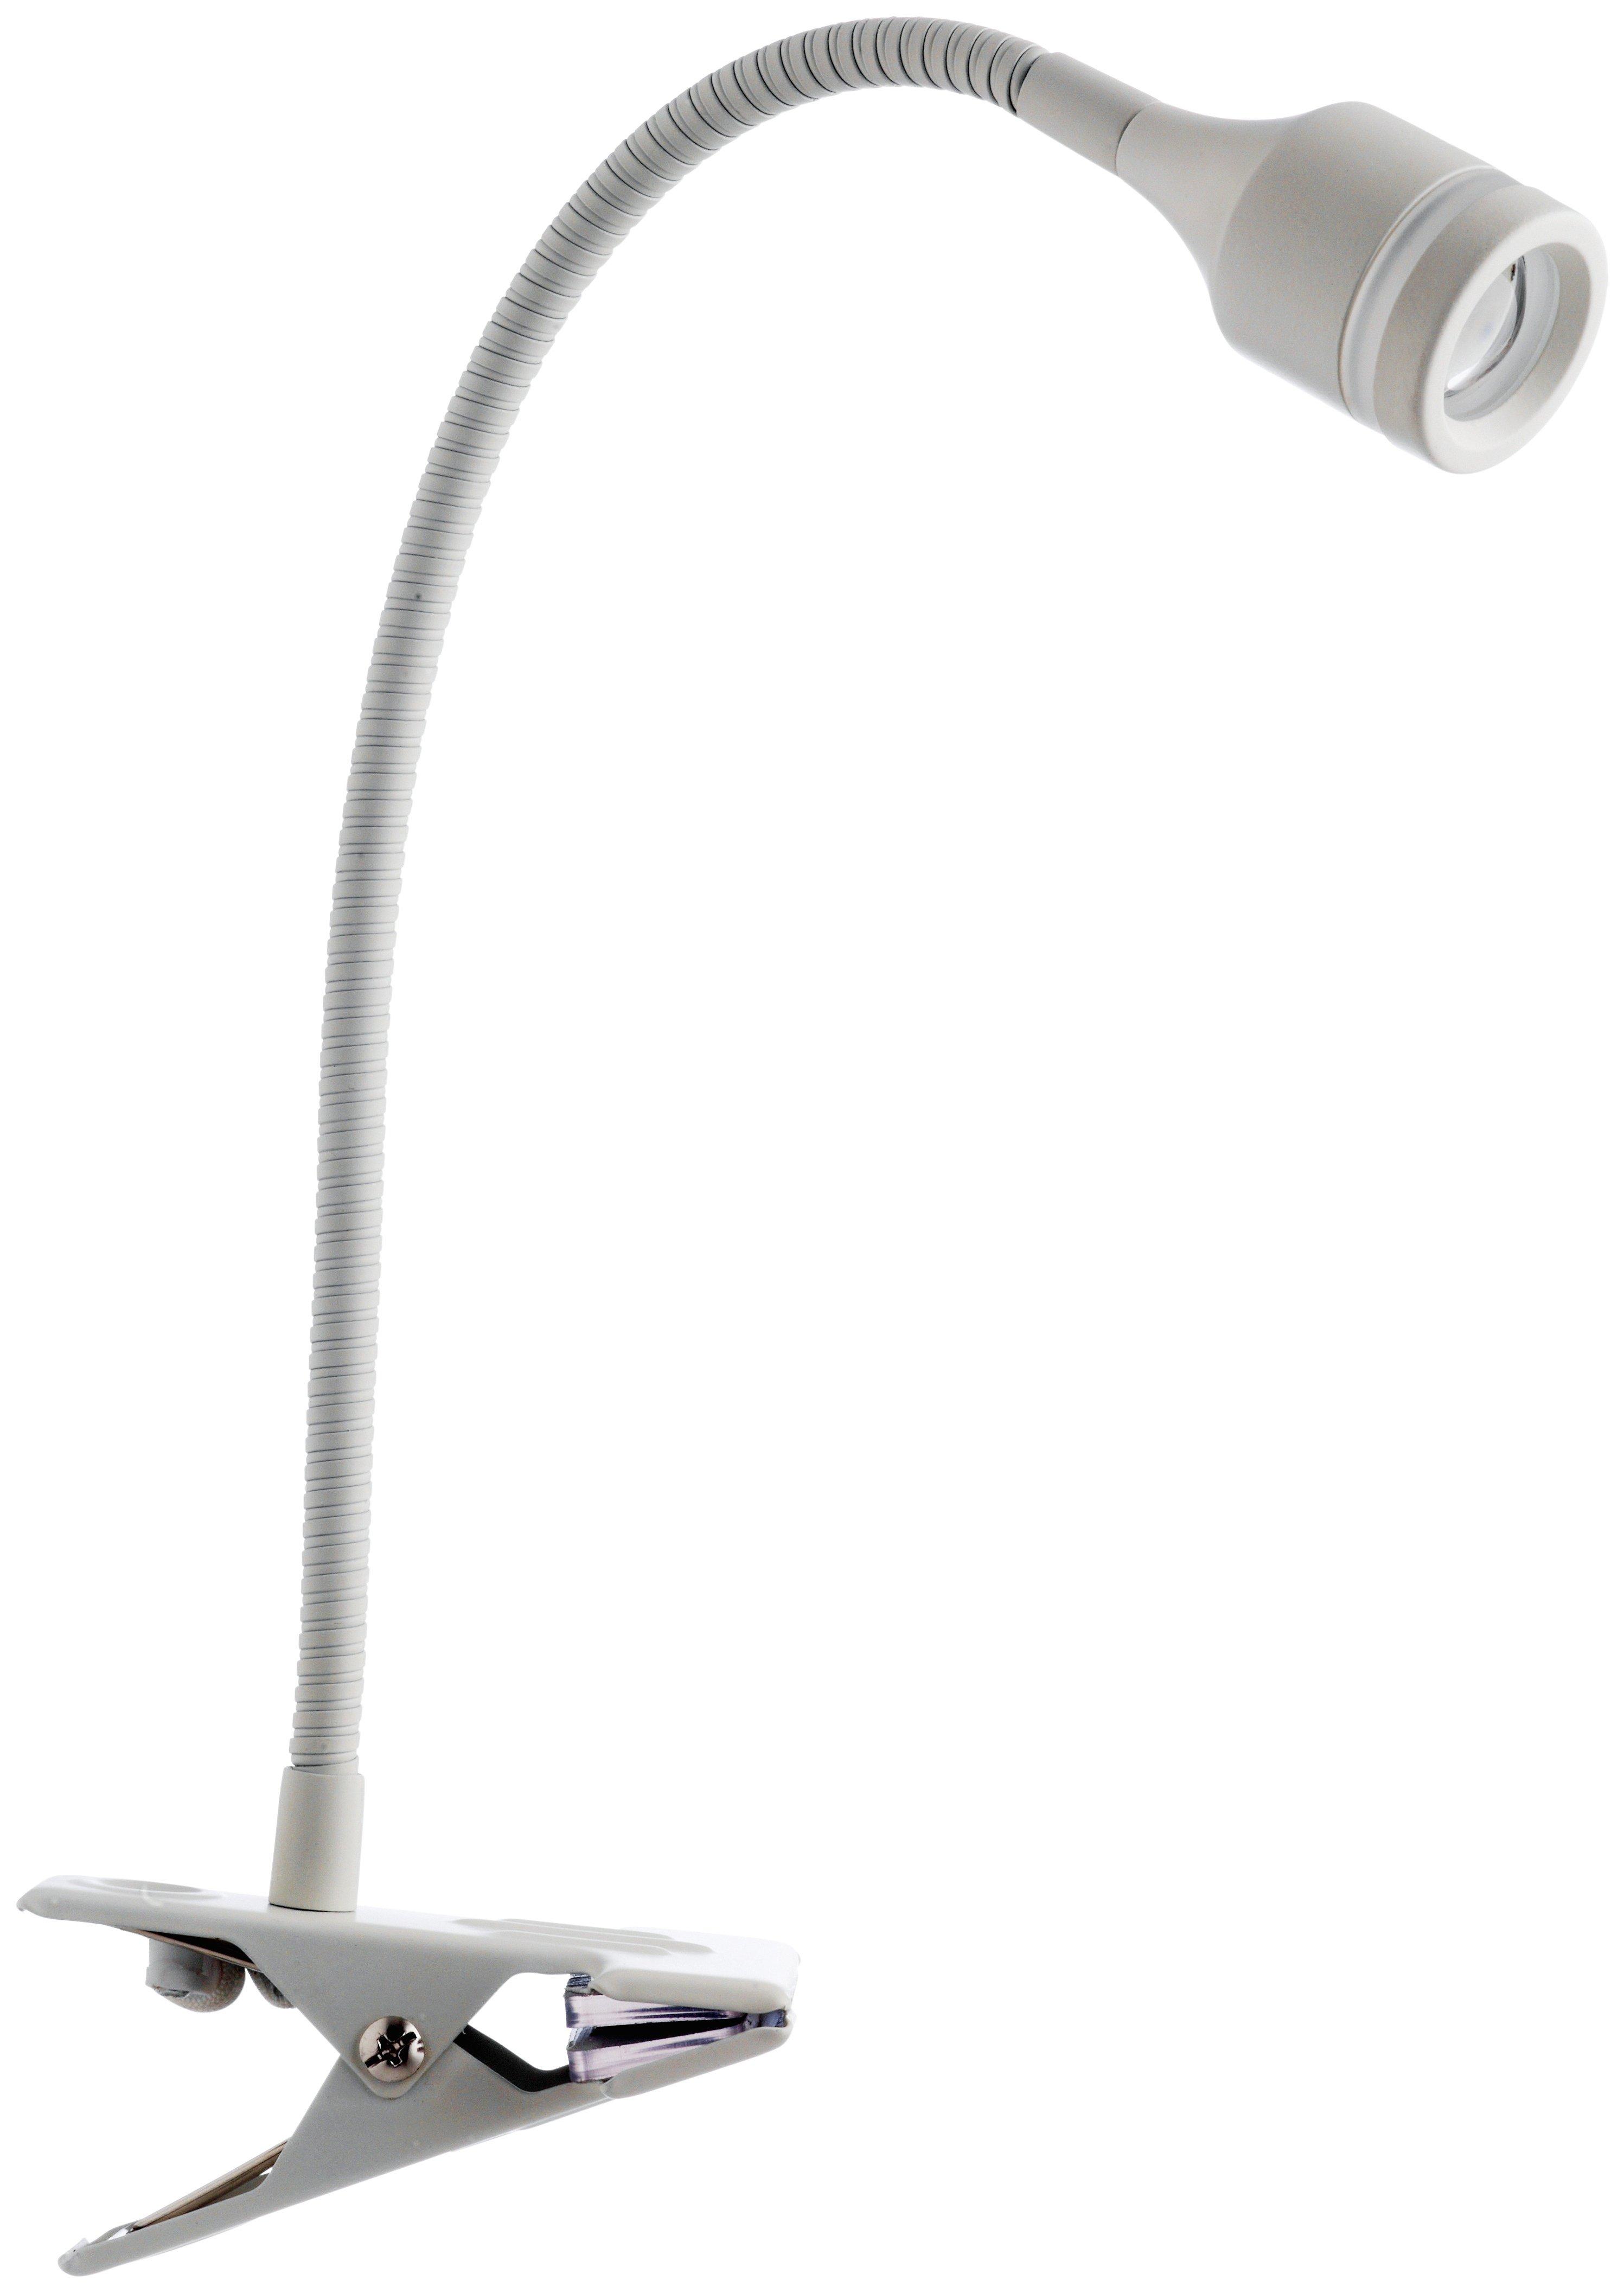 habitat-dex-3w-led-clamp-desk-lamp-white